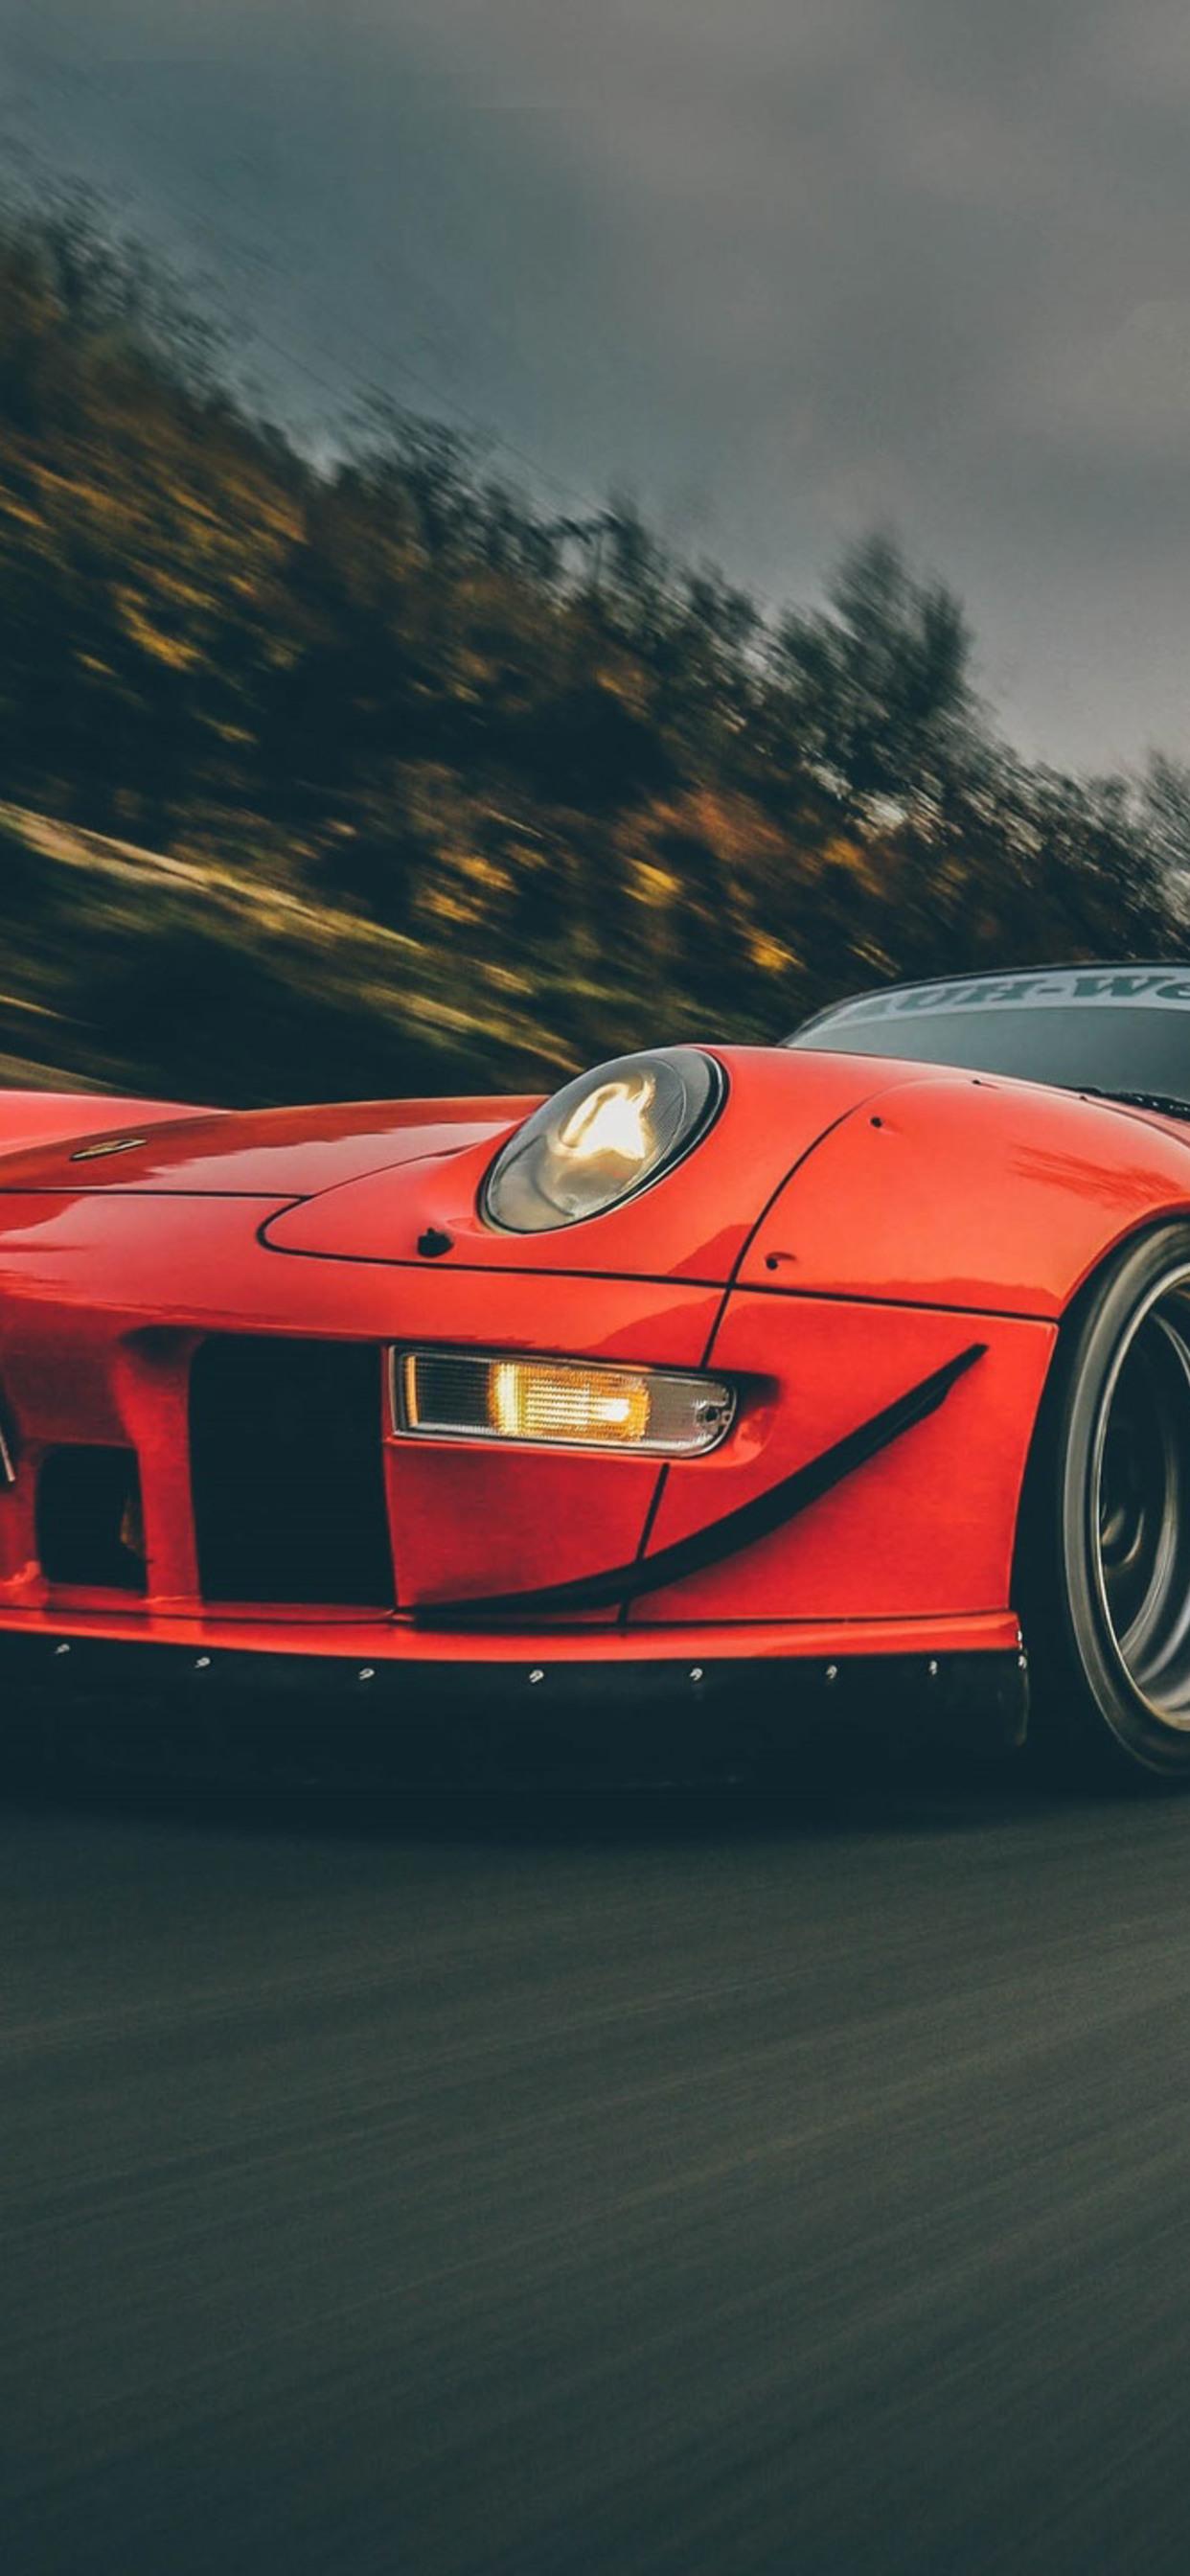 Rwb Porsche 911 Turbo Wallpaper Rwb Porsche Wallpaper Iphone 1329761 Hd Wallpaper Backgrounds Download